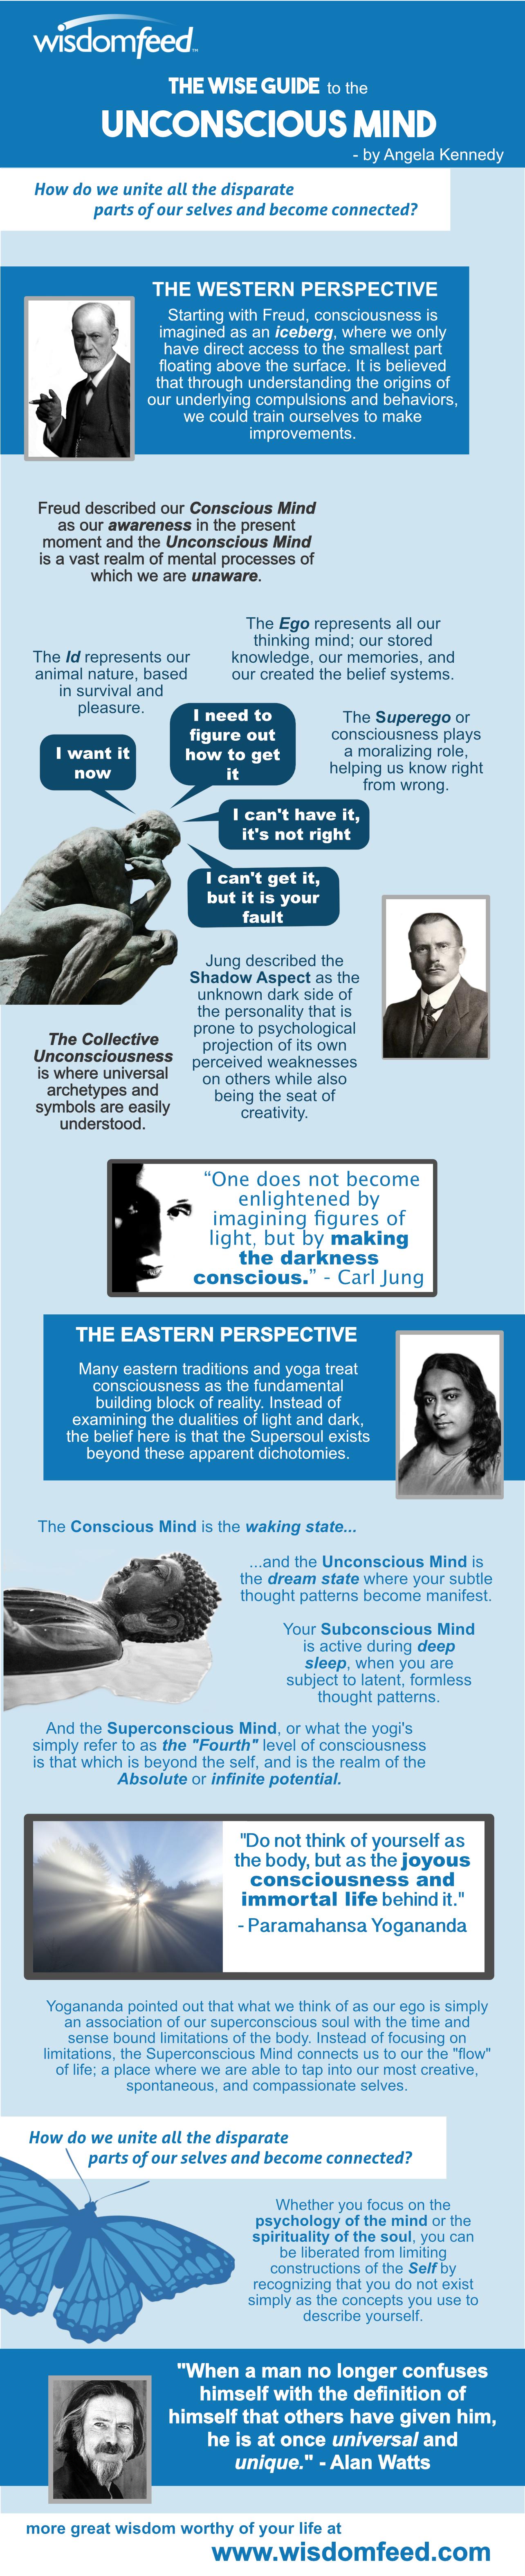 Infographic Unconscious Mind